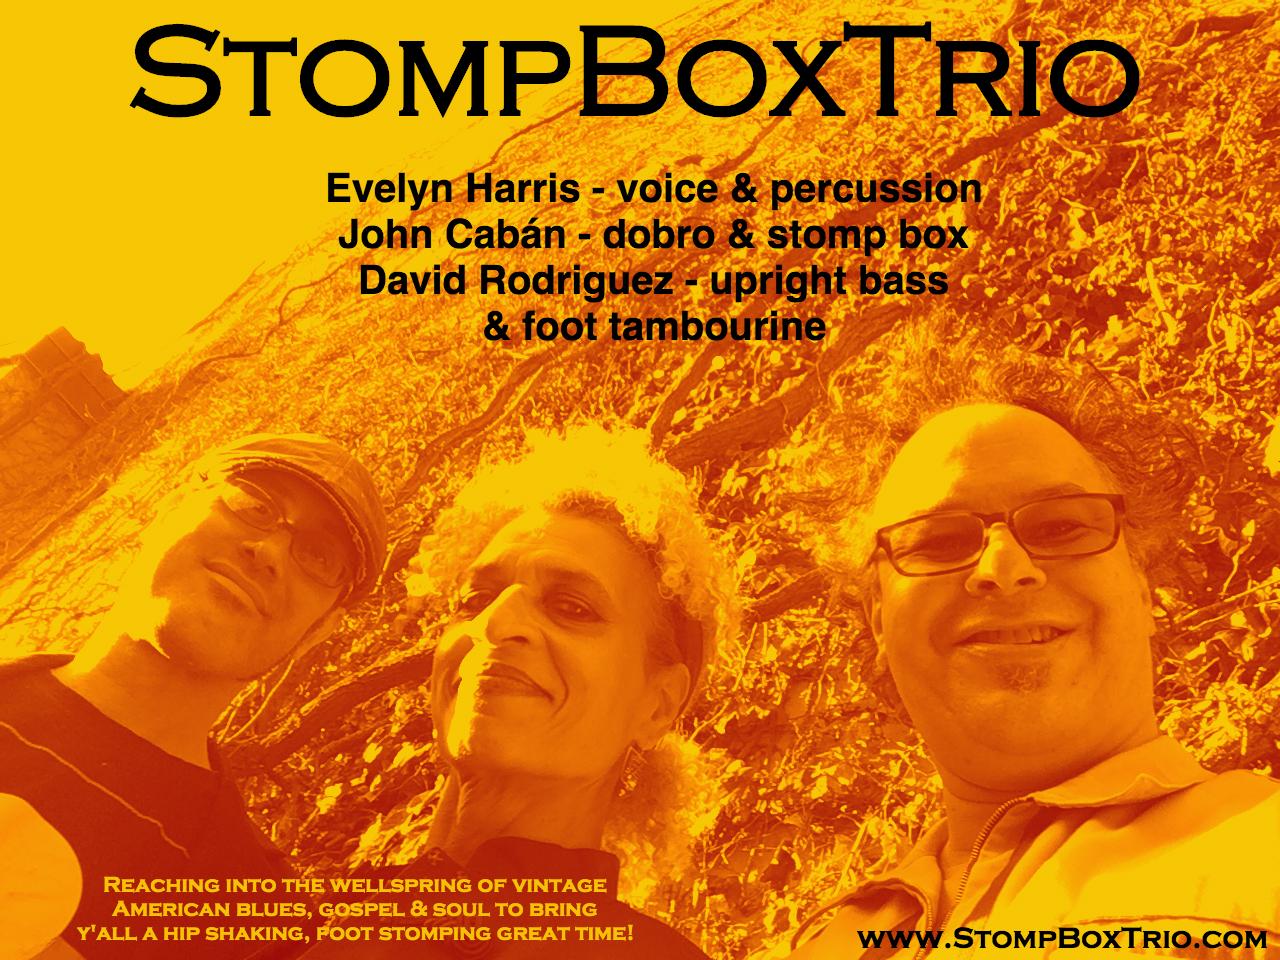 StompBoxTrio - Orange card Big.jpg